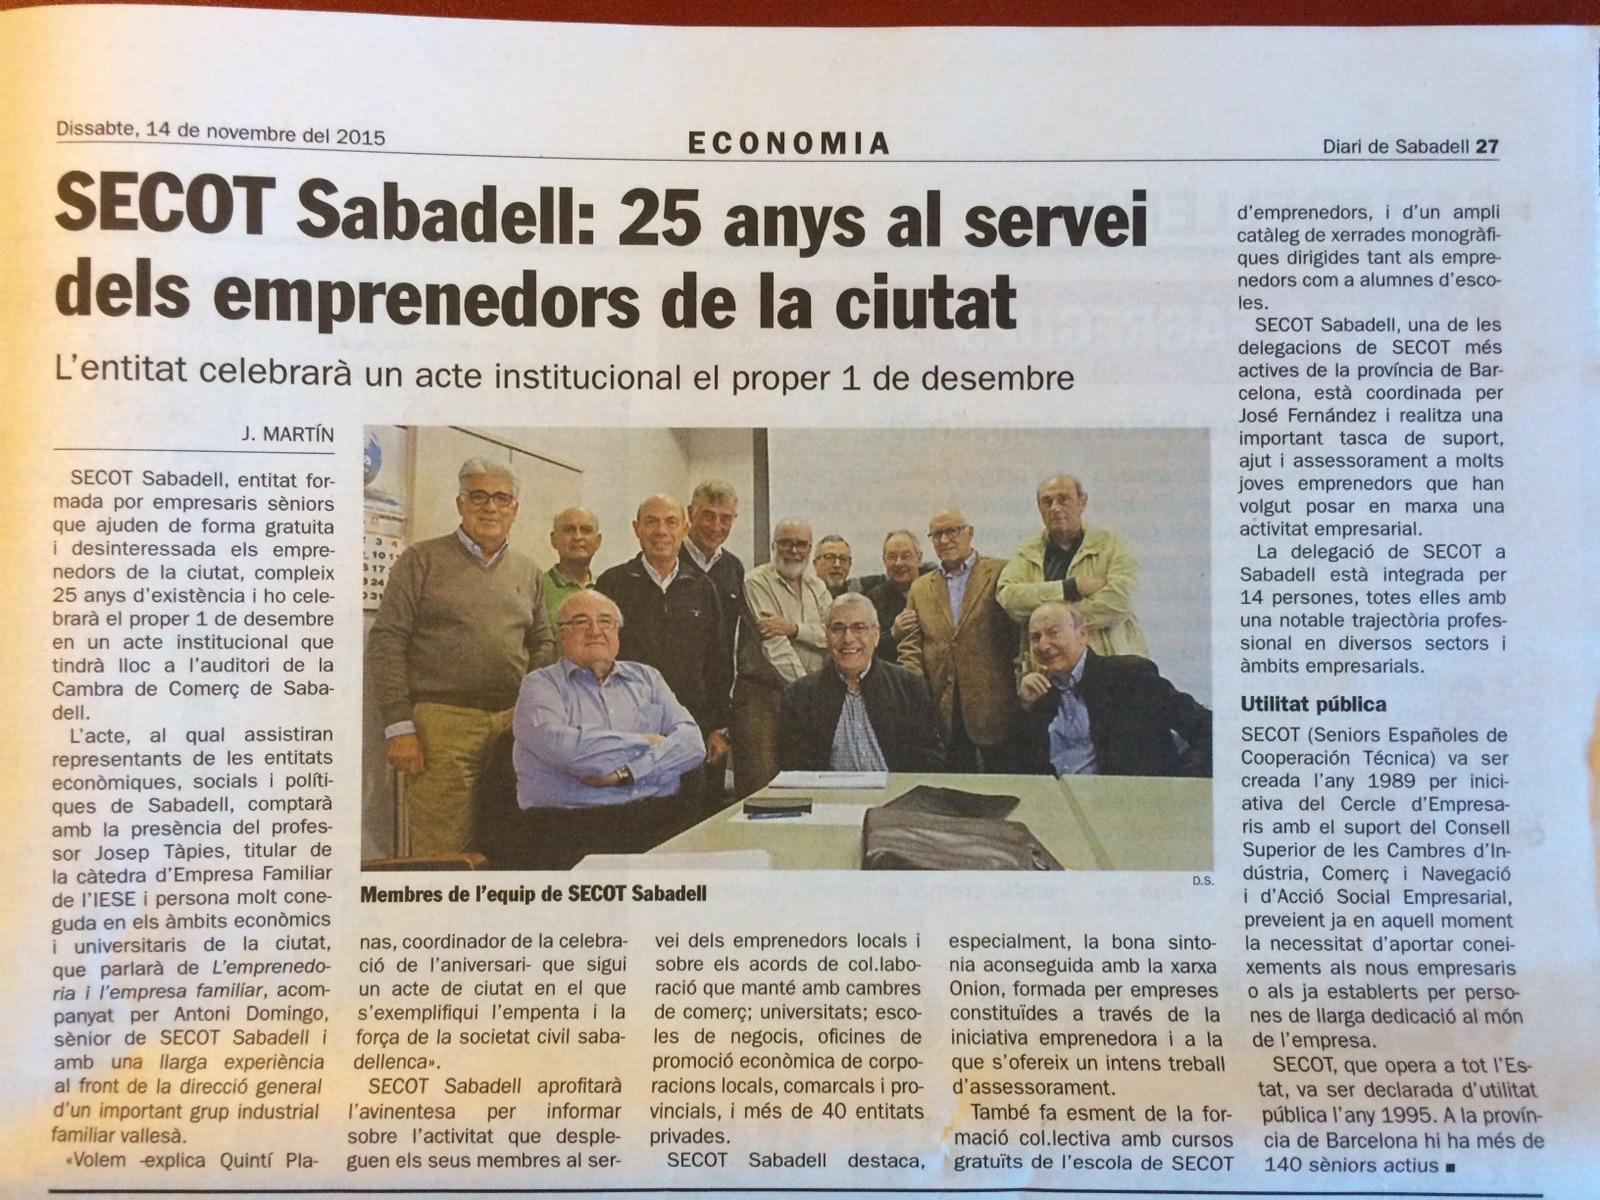 Diari de Sabadell- Economia- 15-11-14